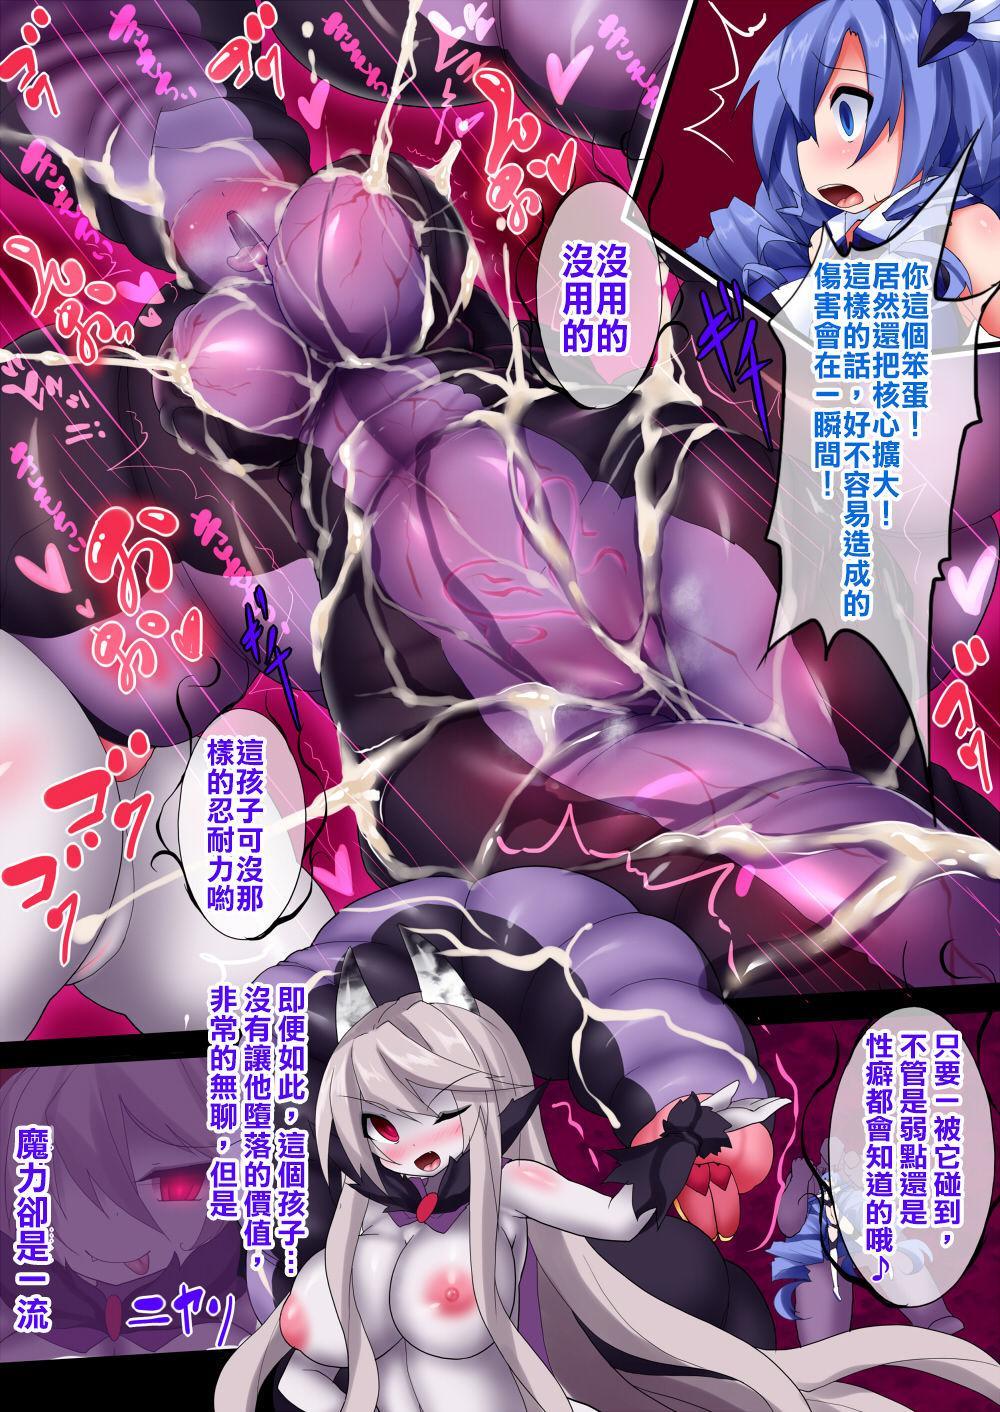 [Makutsutei (Nagai Wataru)] Orgasm Unit EX -Mahou Senshi Akari Ch. 1-5 [Chinese] [这很恶堕 x Lolipoi汉化组] 82